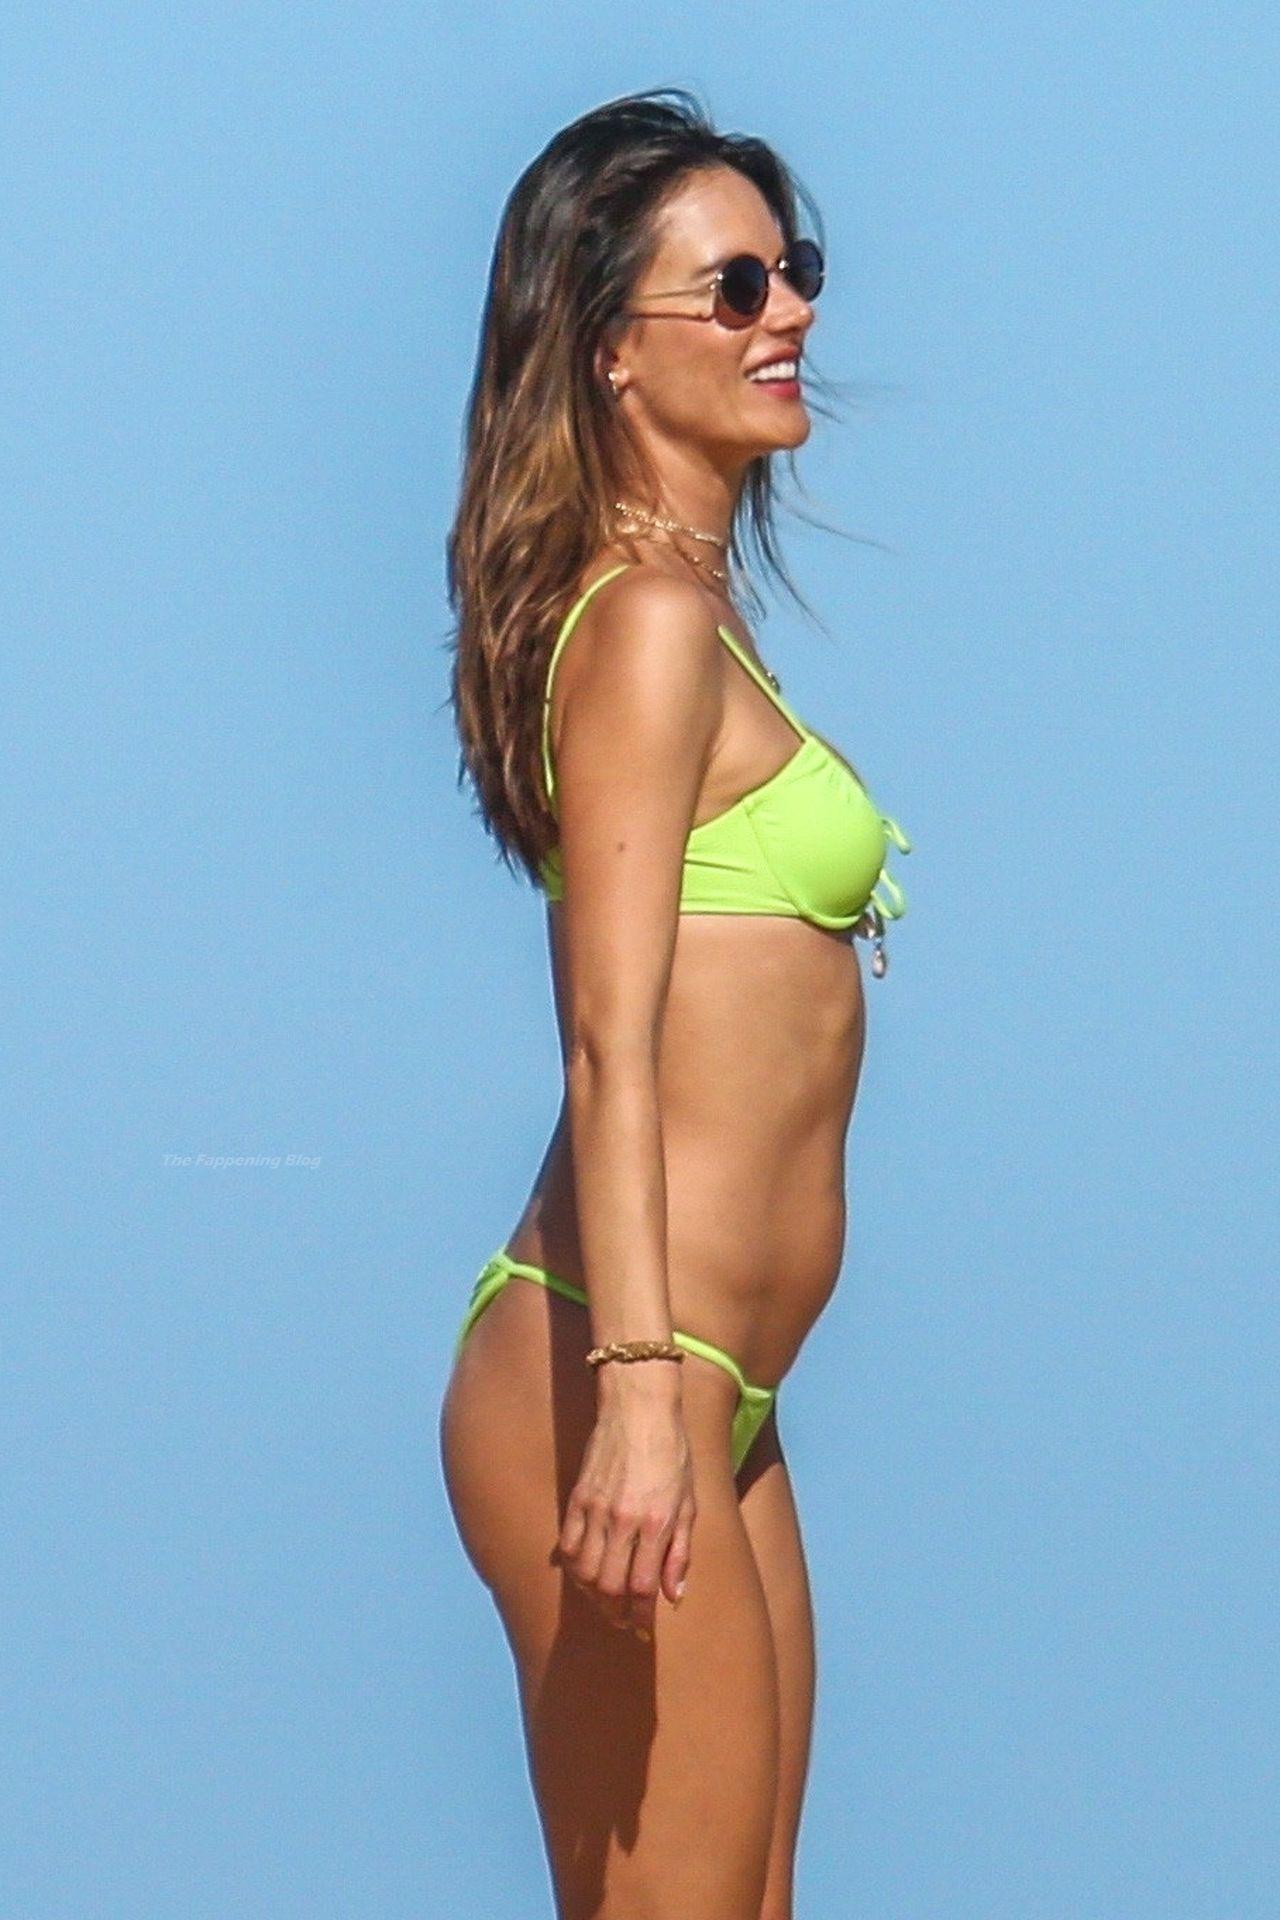 Alessandra-Ambrosio-Sexy-The-Fappening-Blog-771.jpg